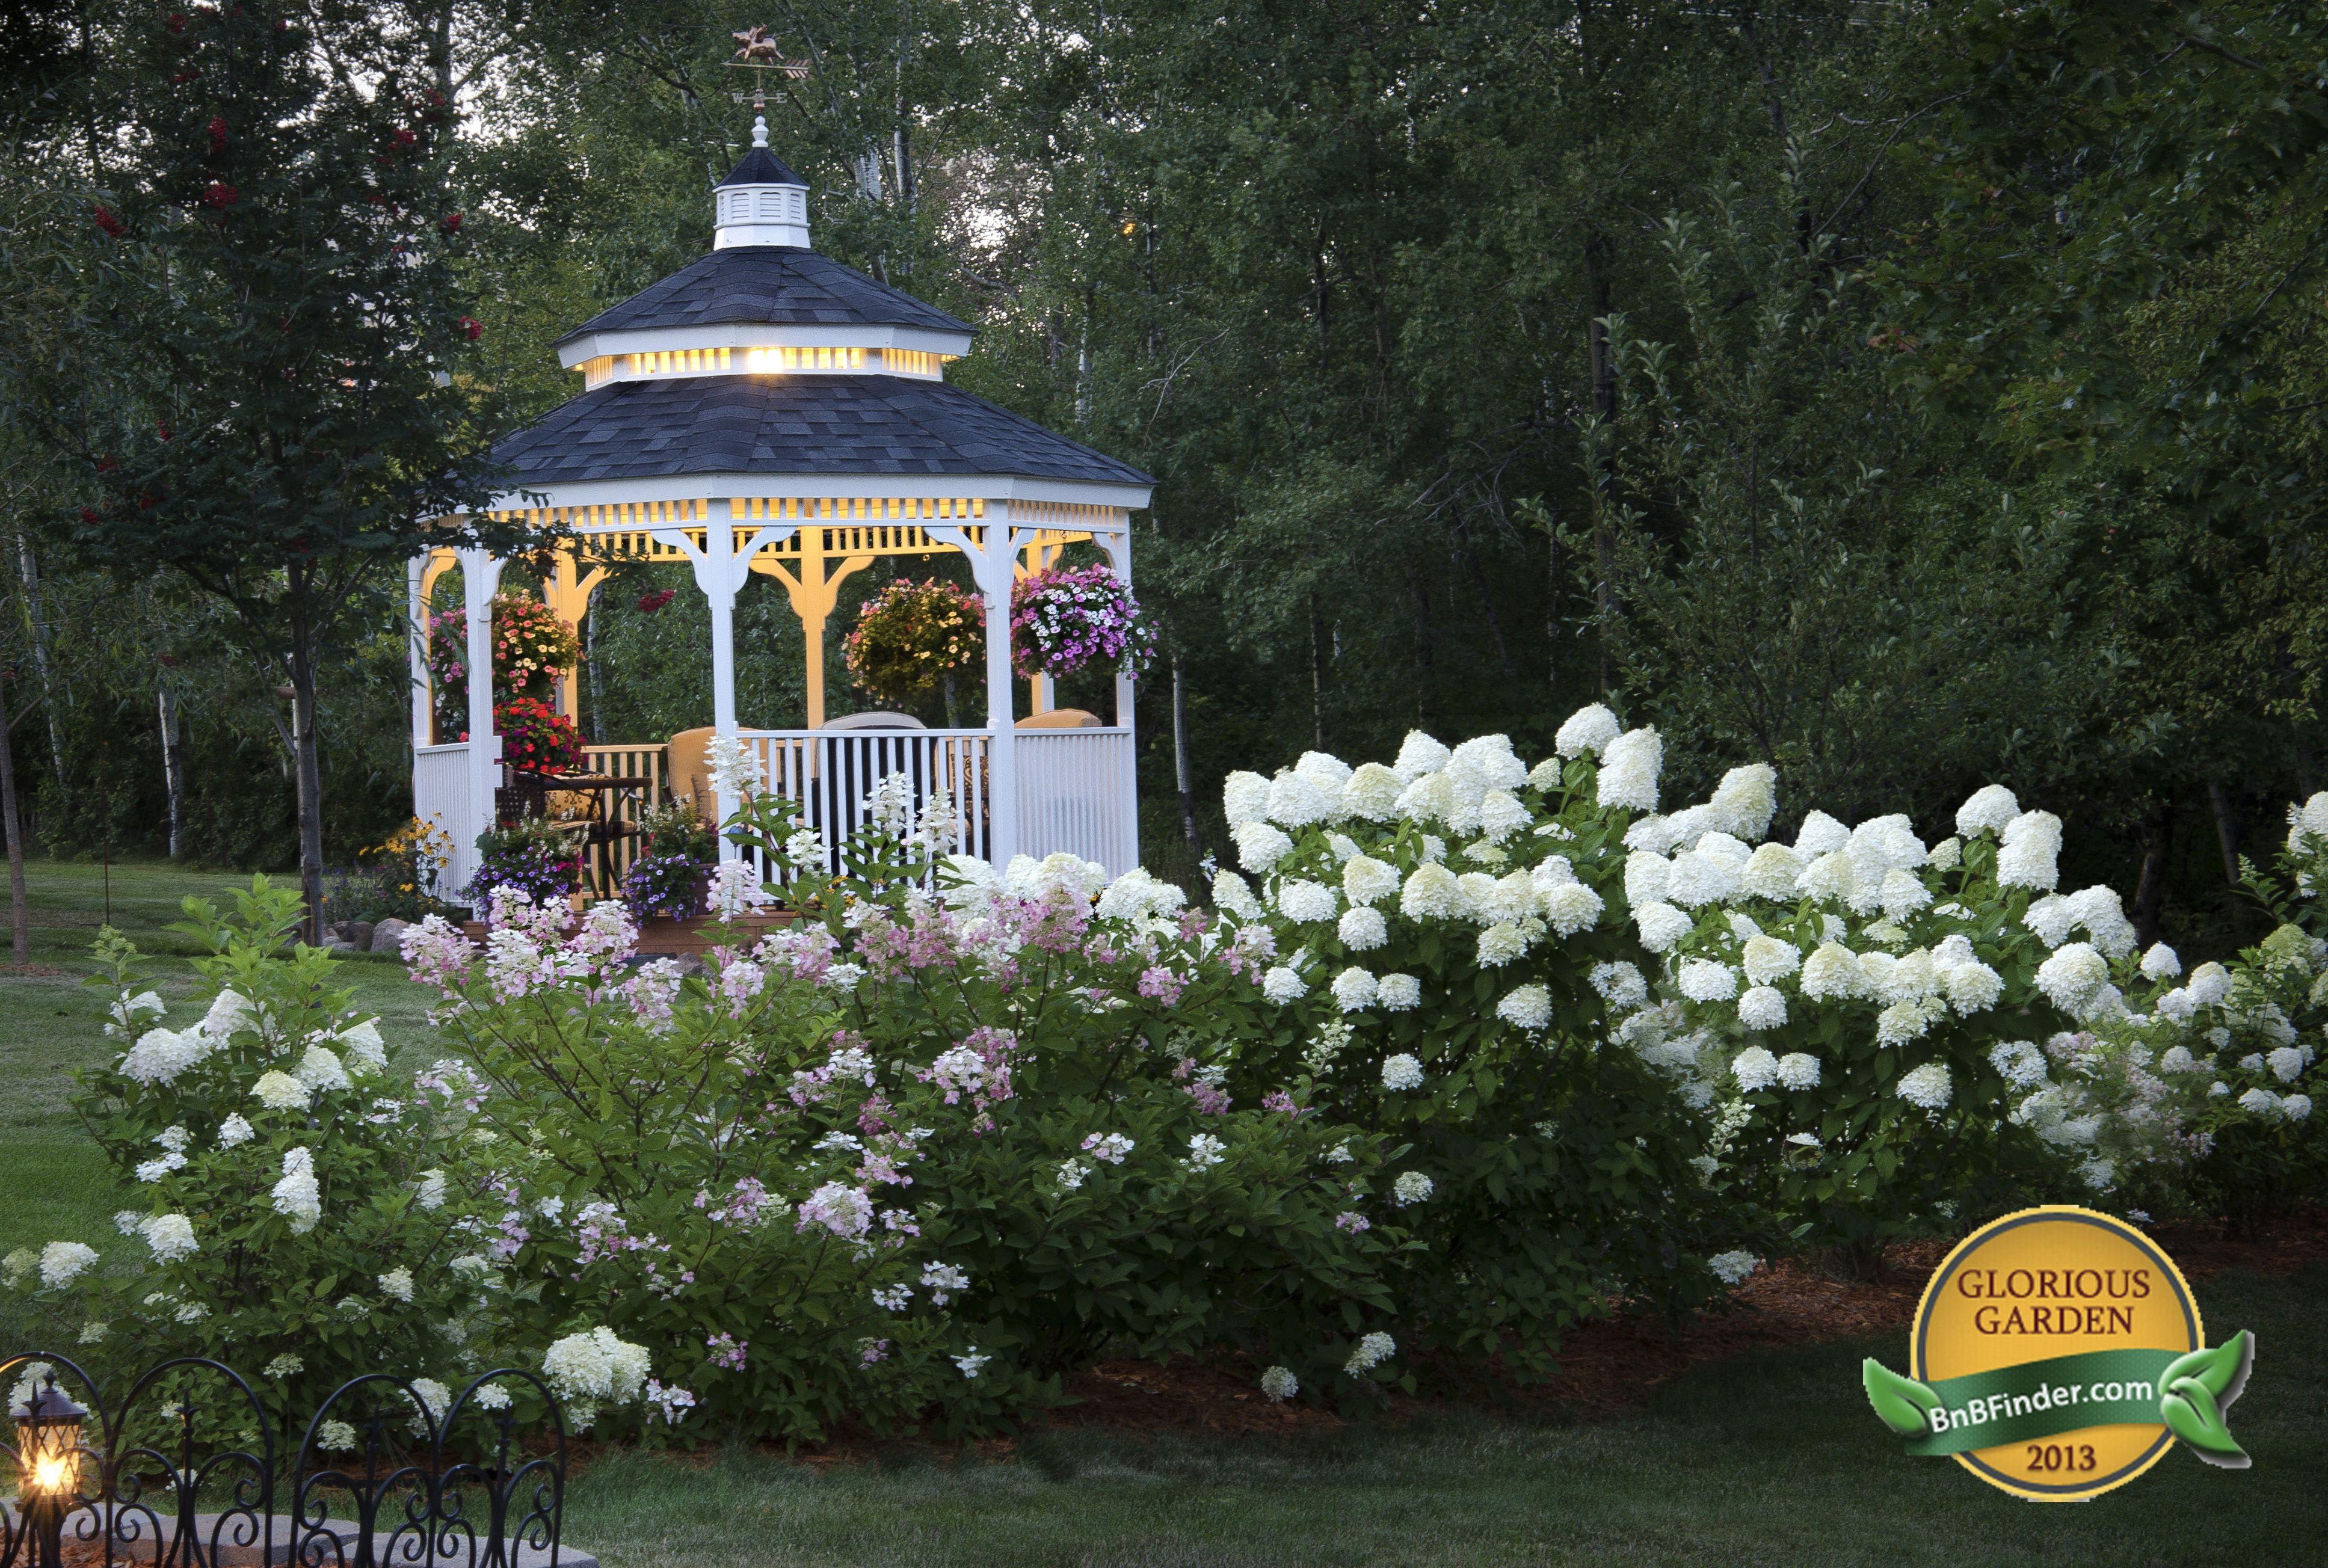 2013 Glorious Garden Award Winner A G Thomson House